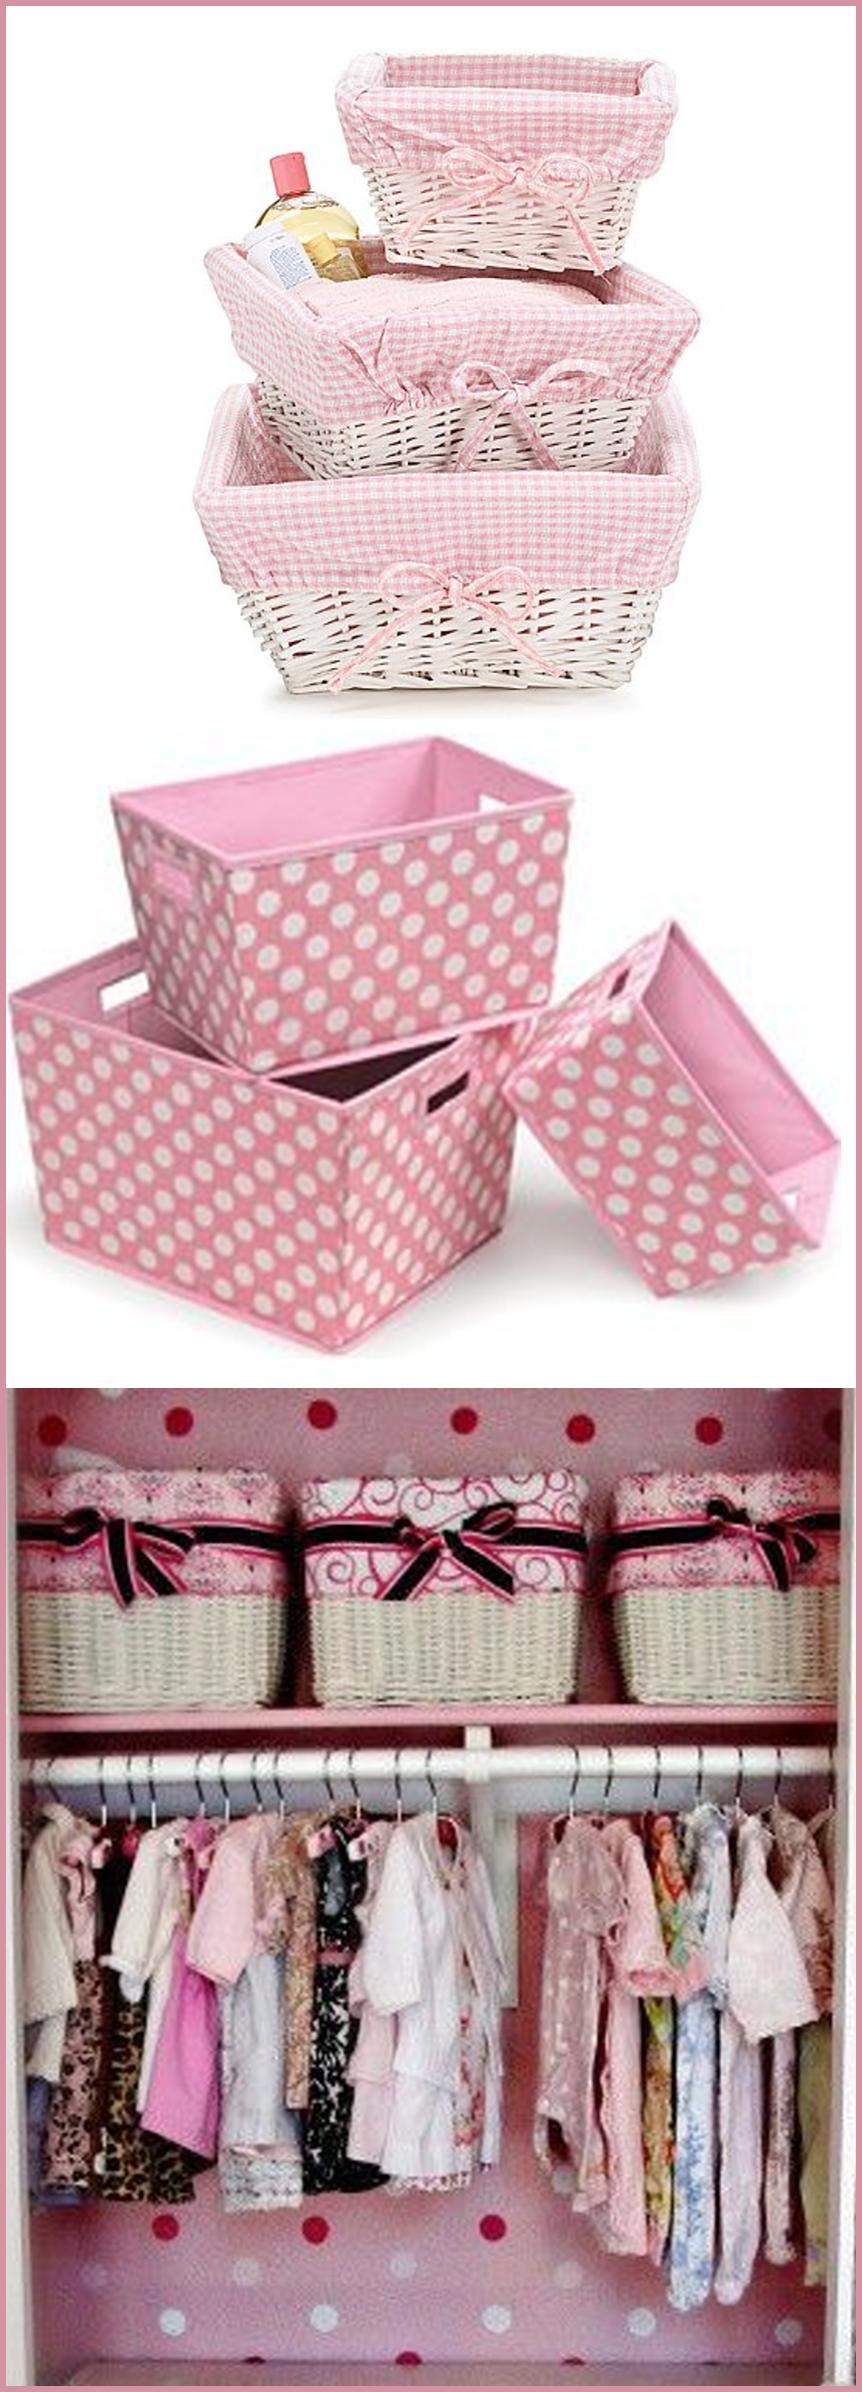 Baskets to organize baby girl nursery closet.